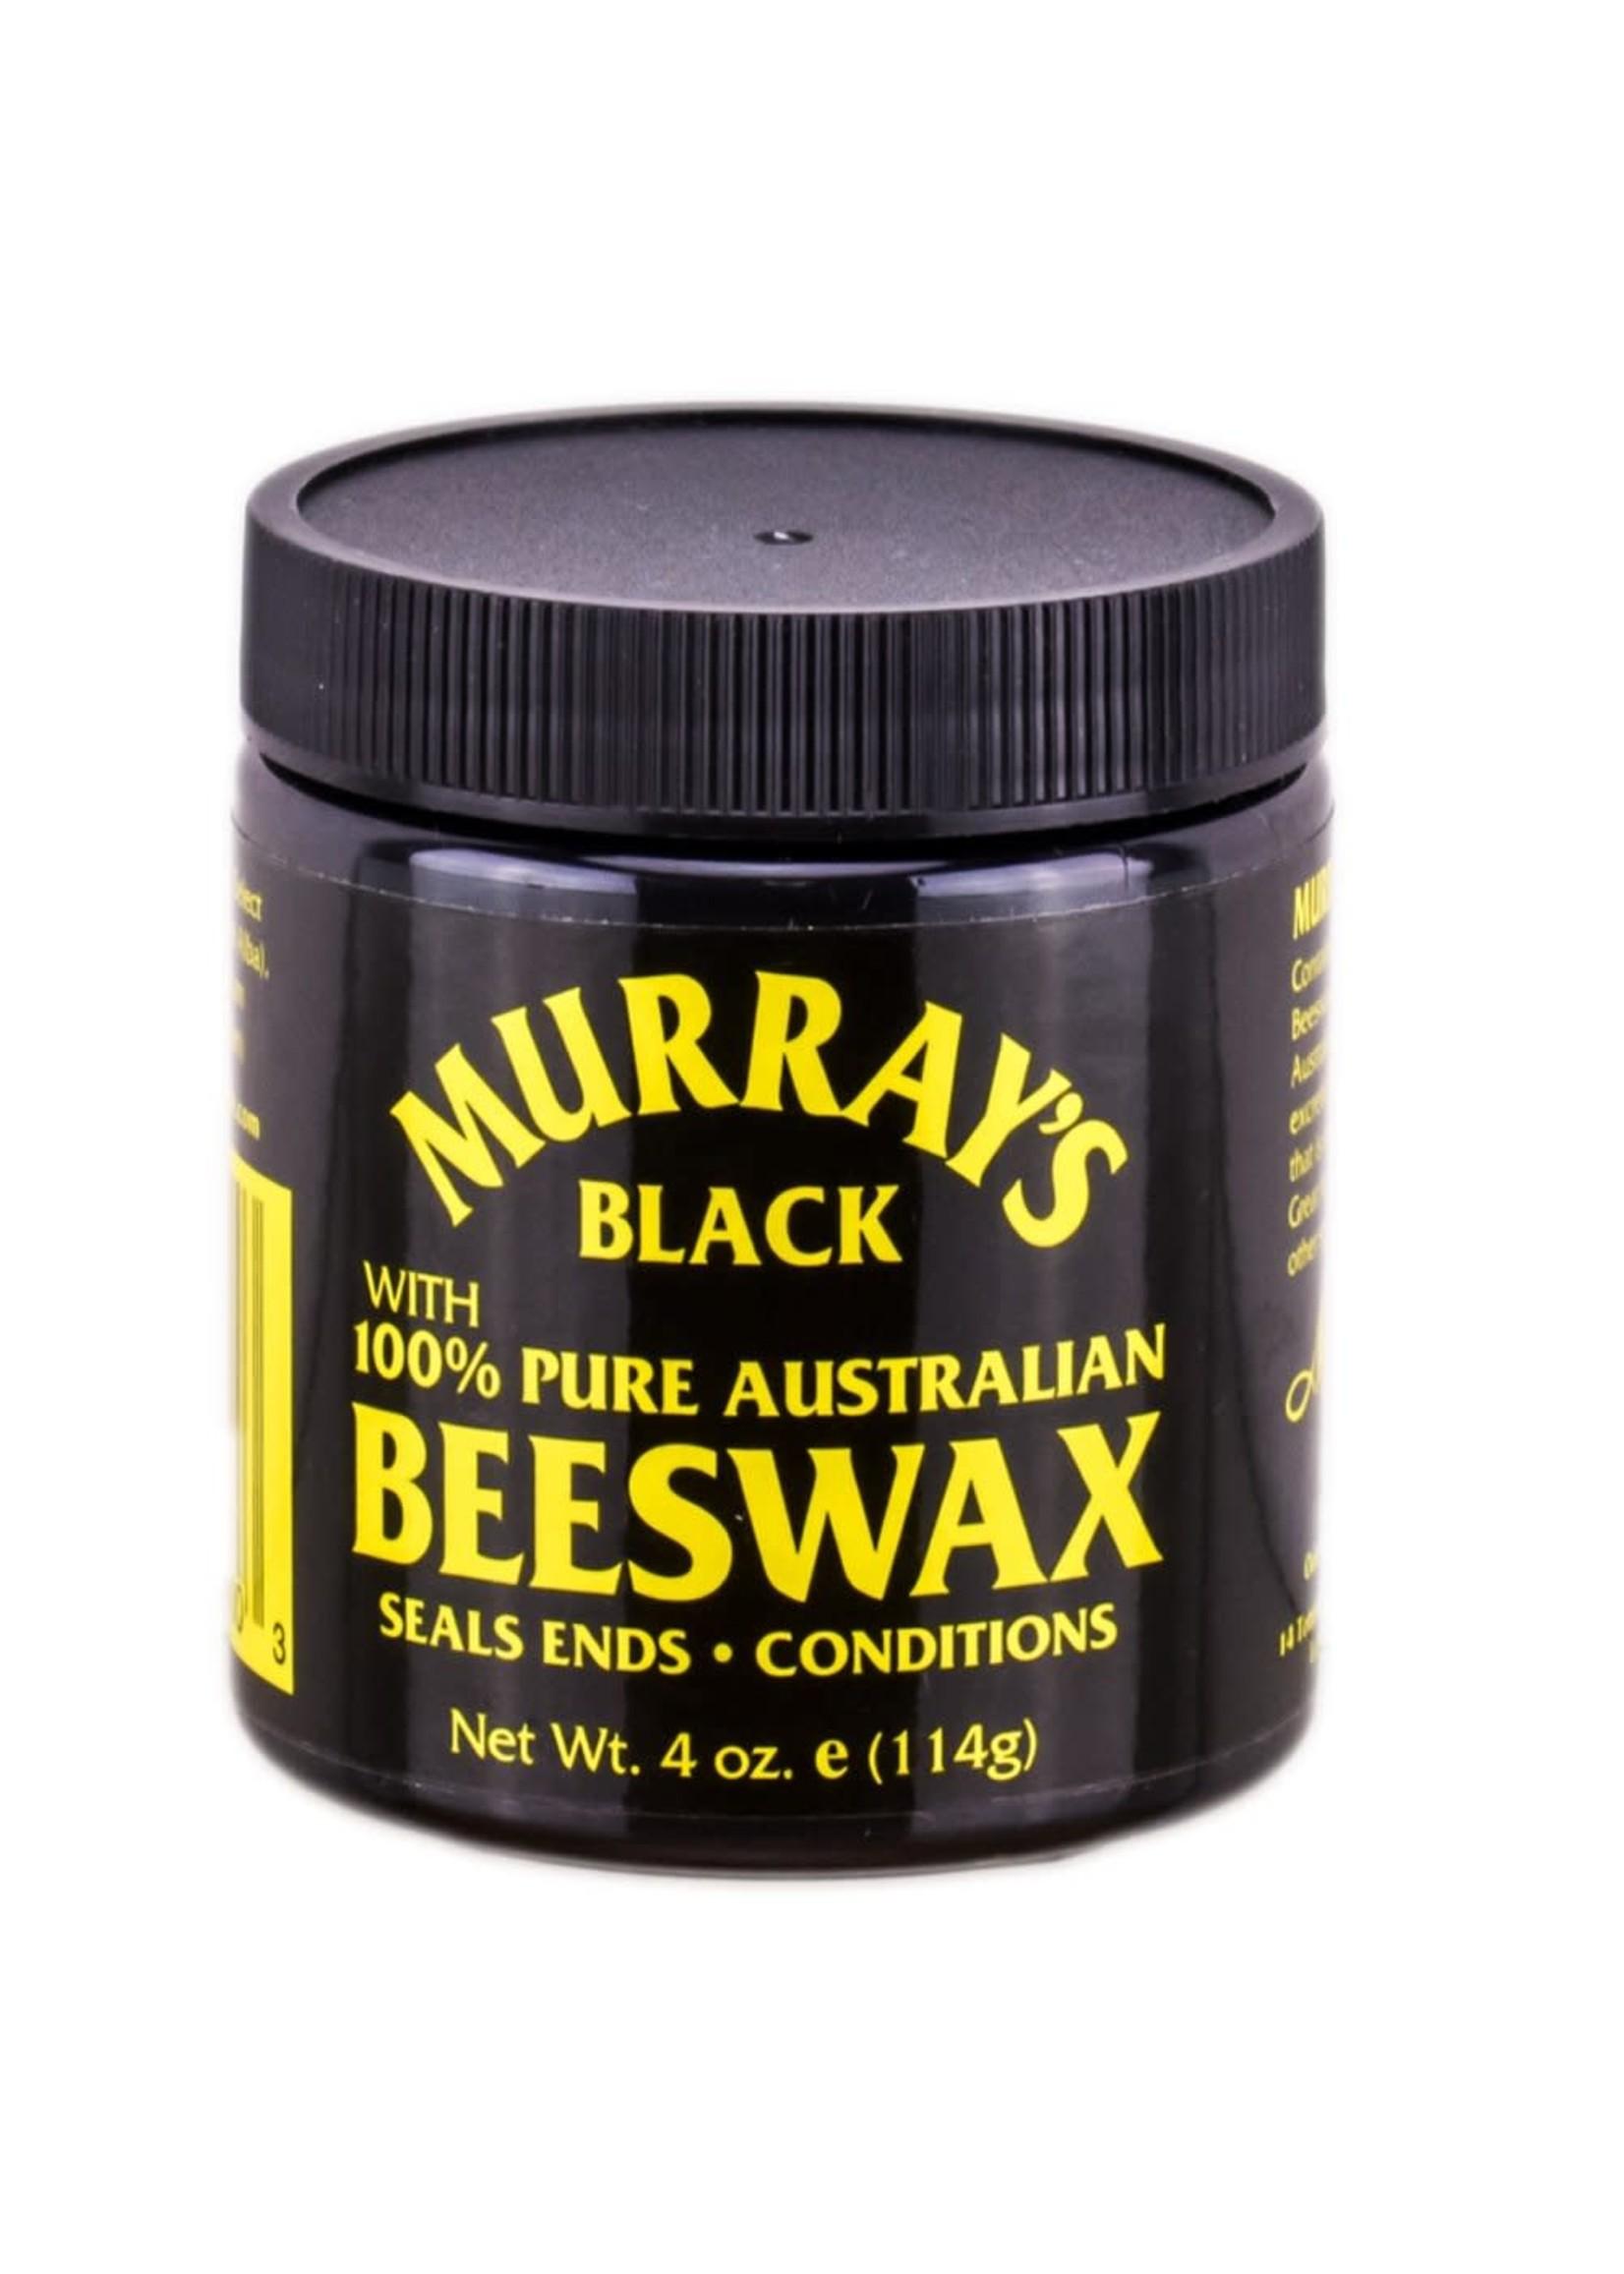 Murray's Beeswax Black 4oz